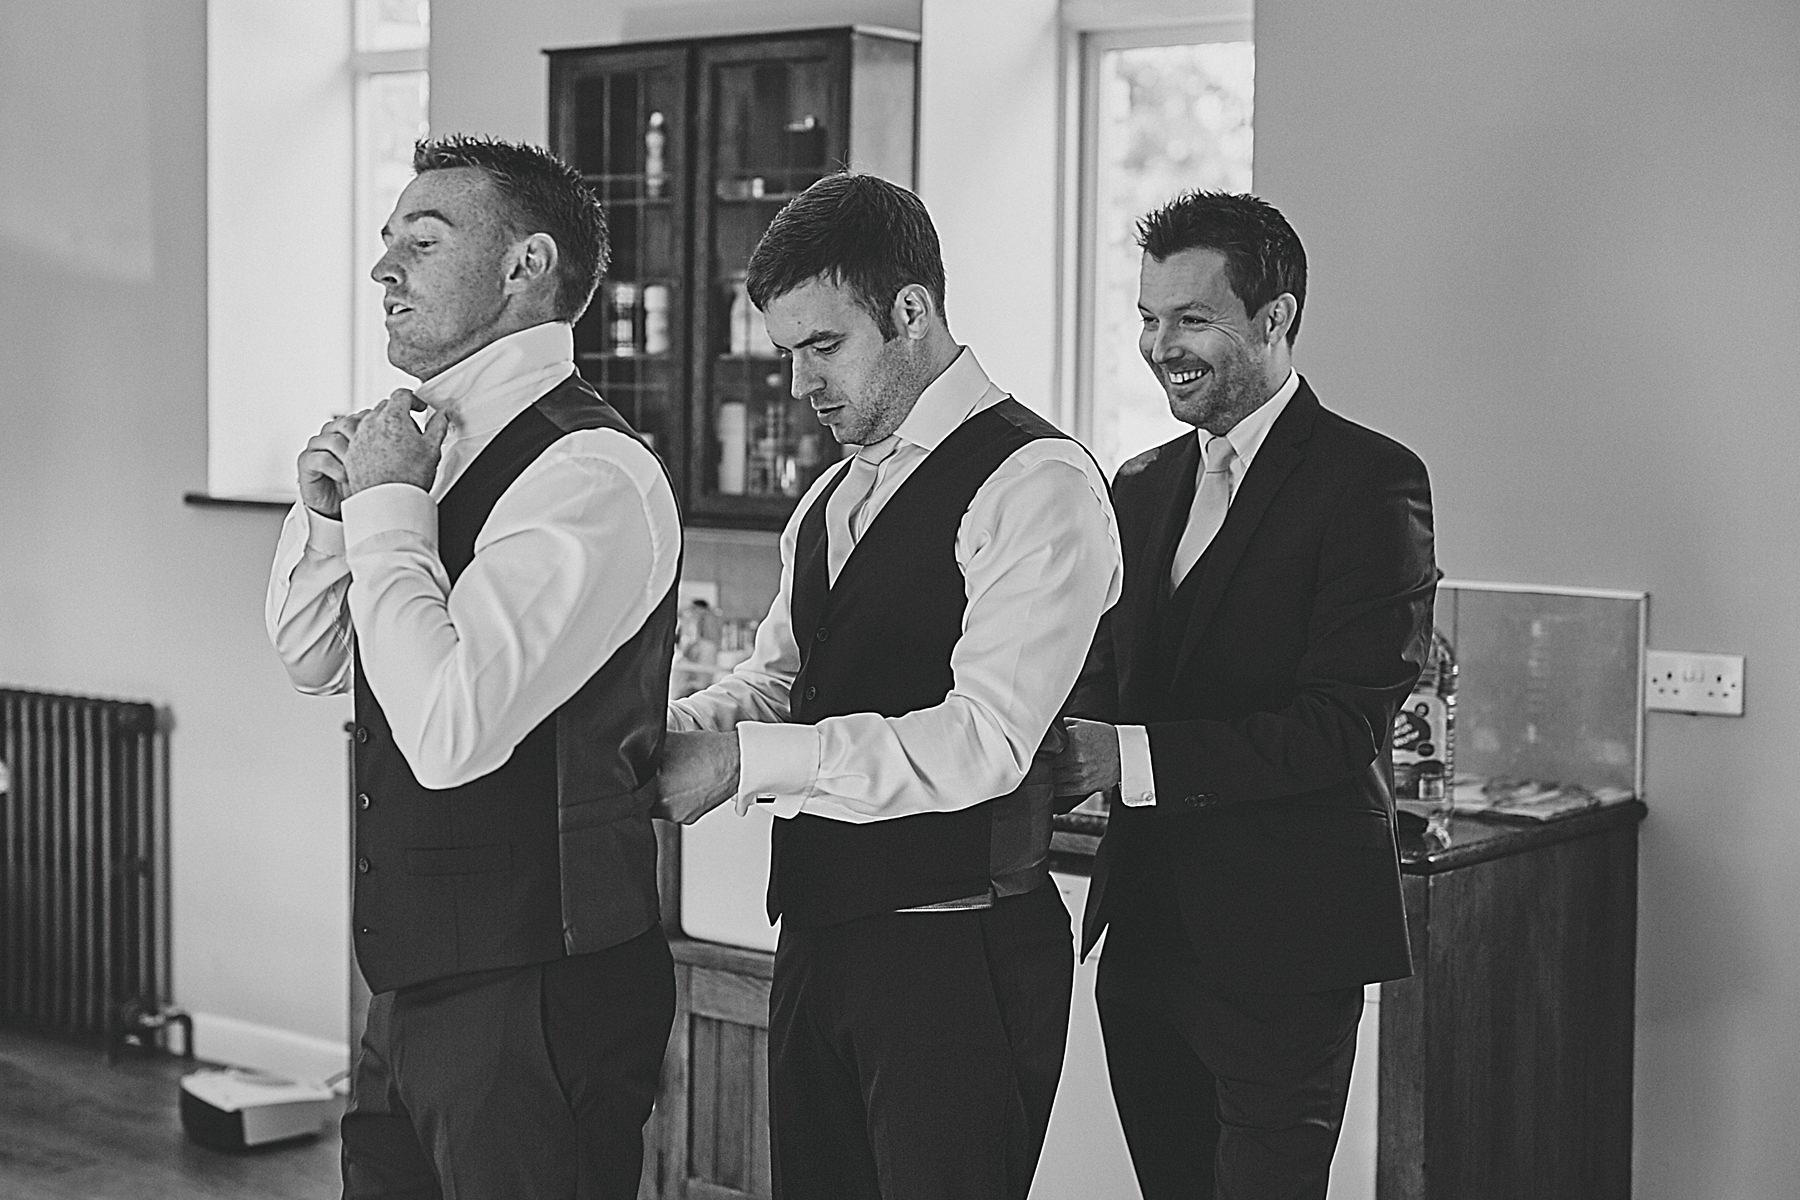 Wedding at Borris House co.Carlow 017 - Borris House wedding | Cara & David